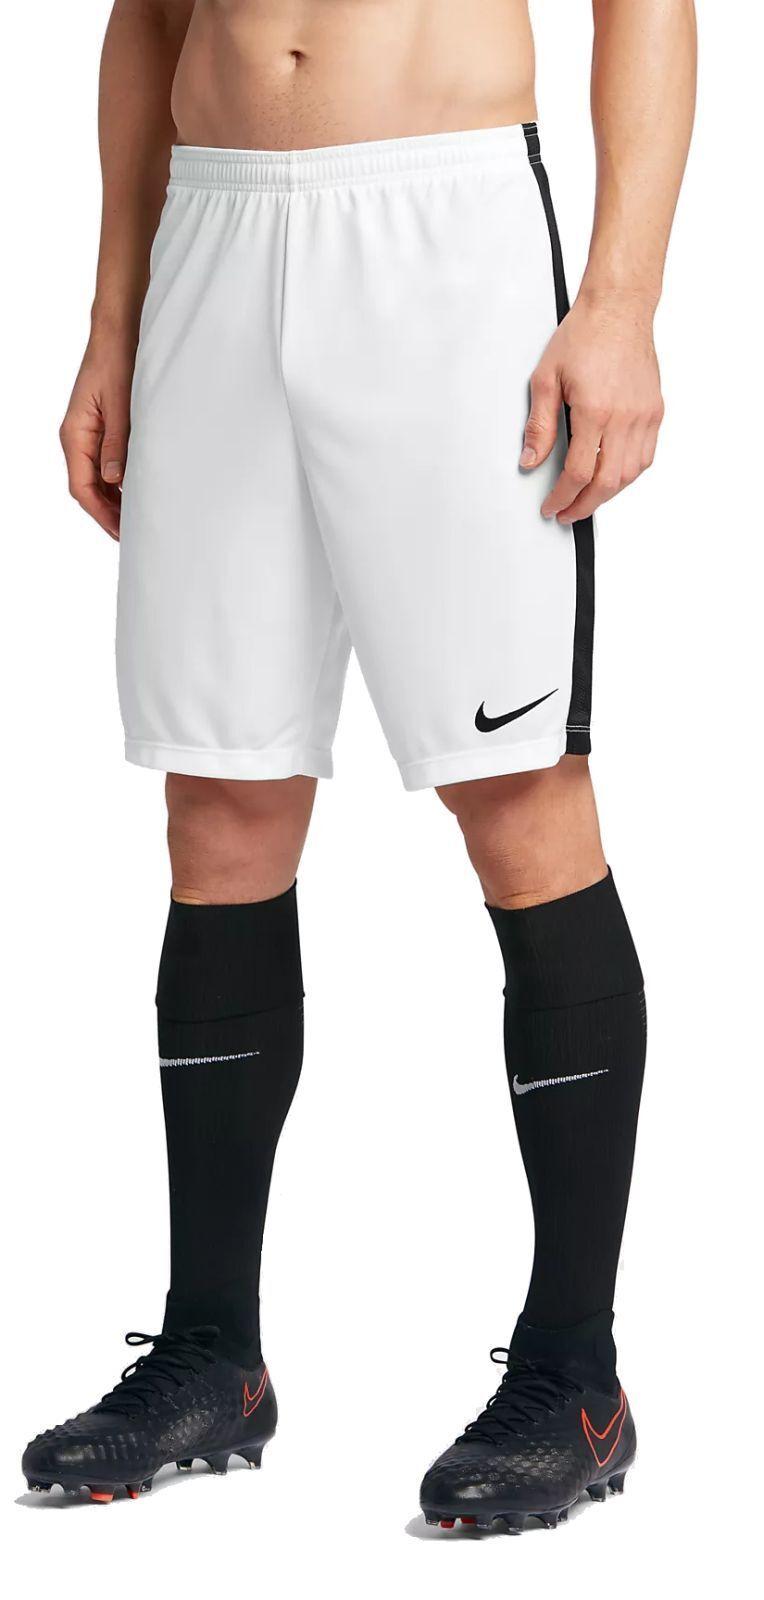 Nike Hommes Football Fitness Academy Short NIKE dry Academy Fitness Short Blanc Noir 6a7b83